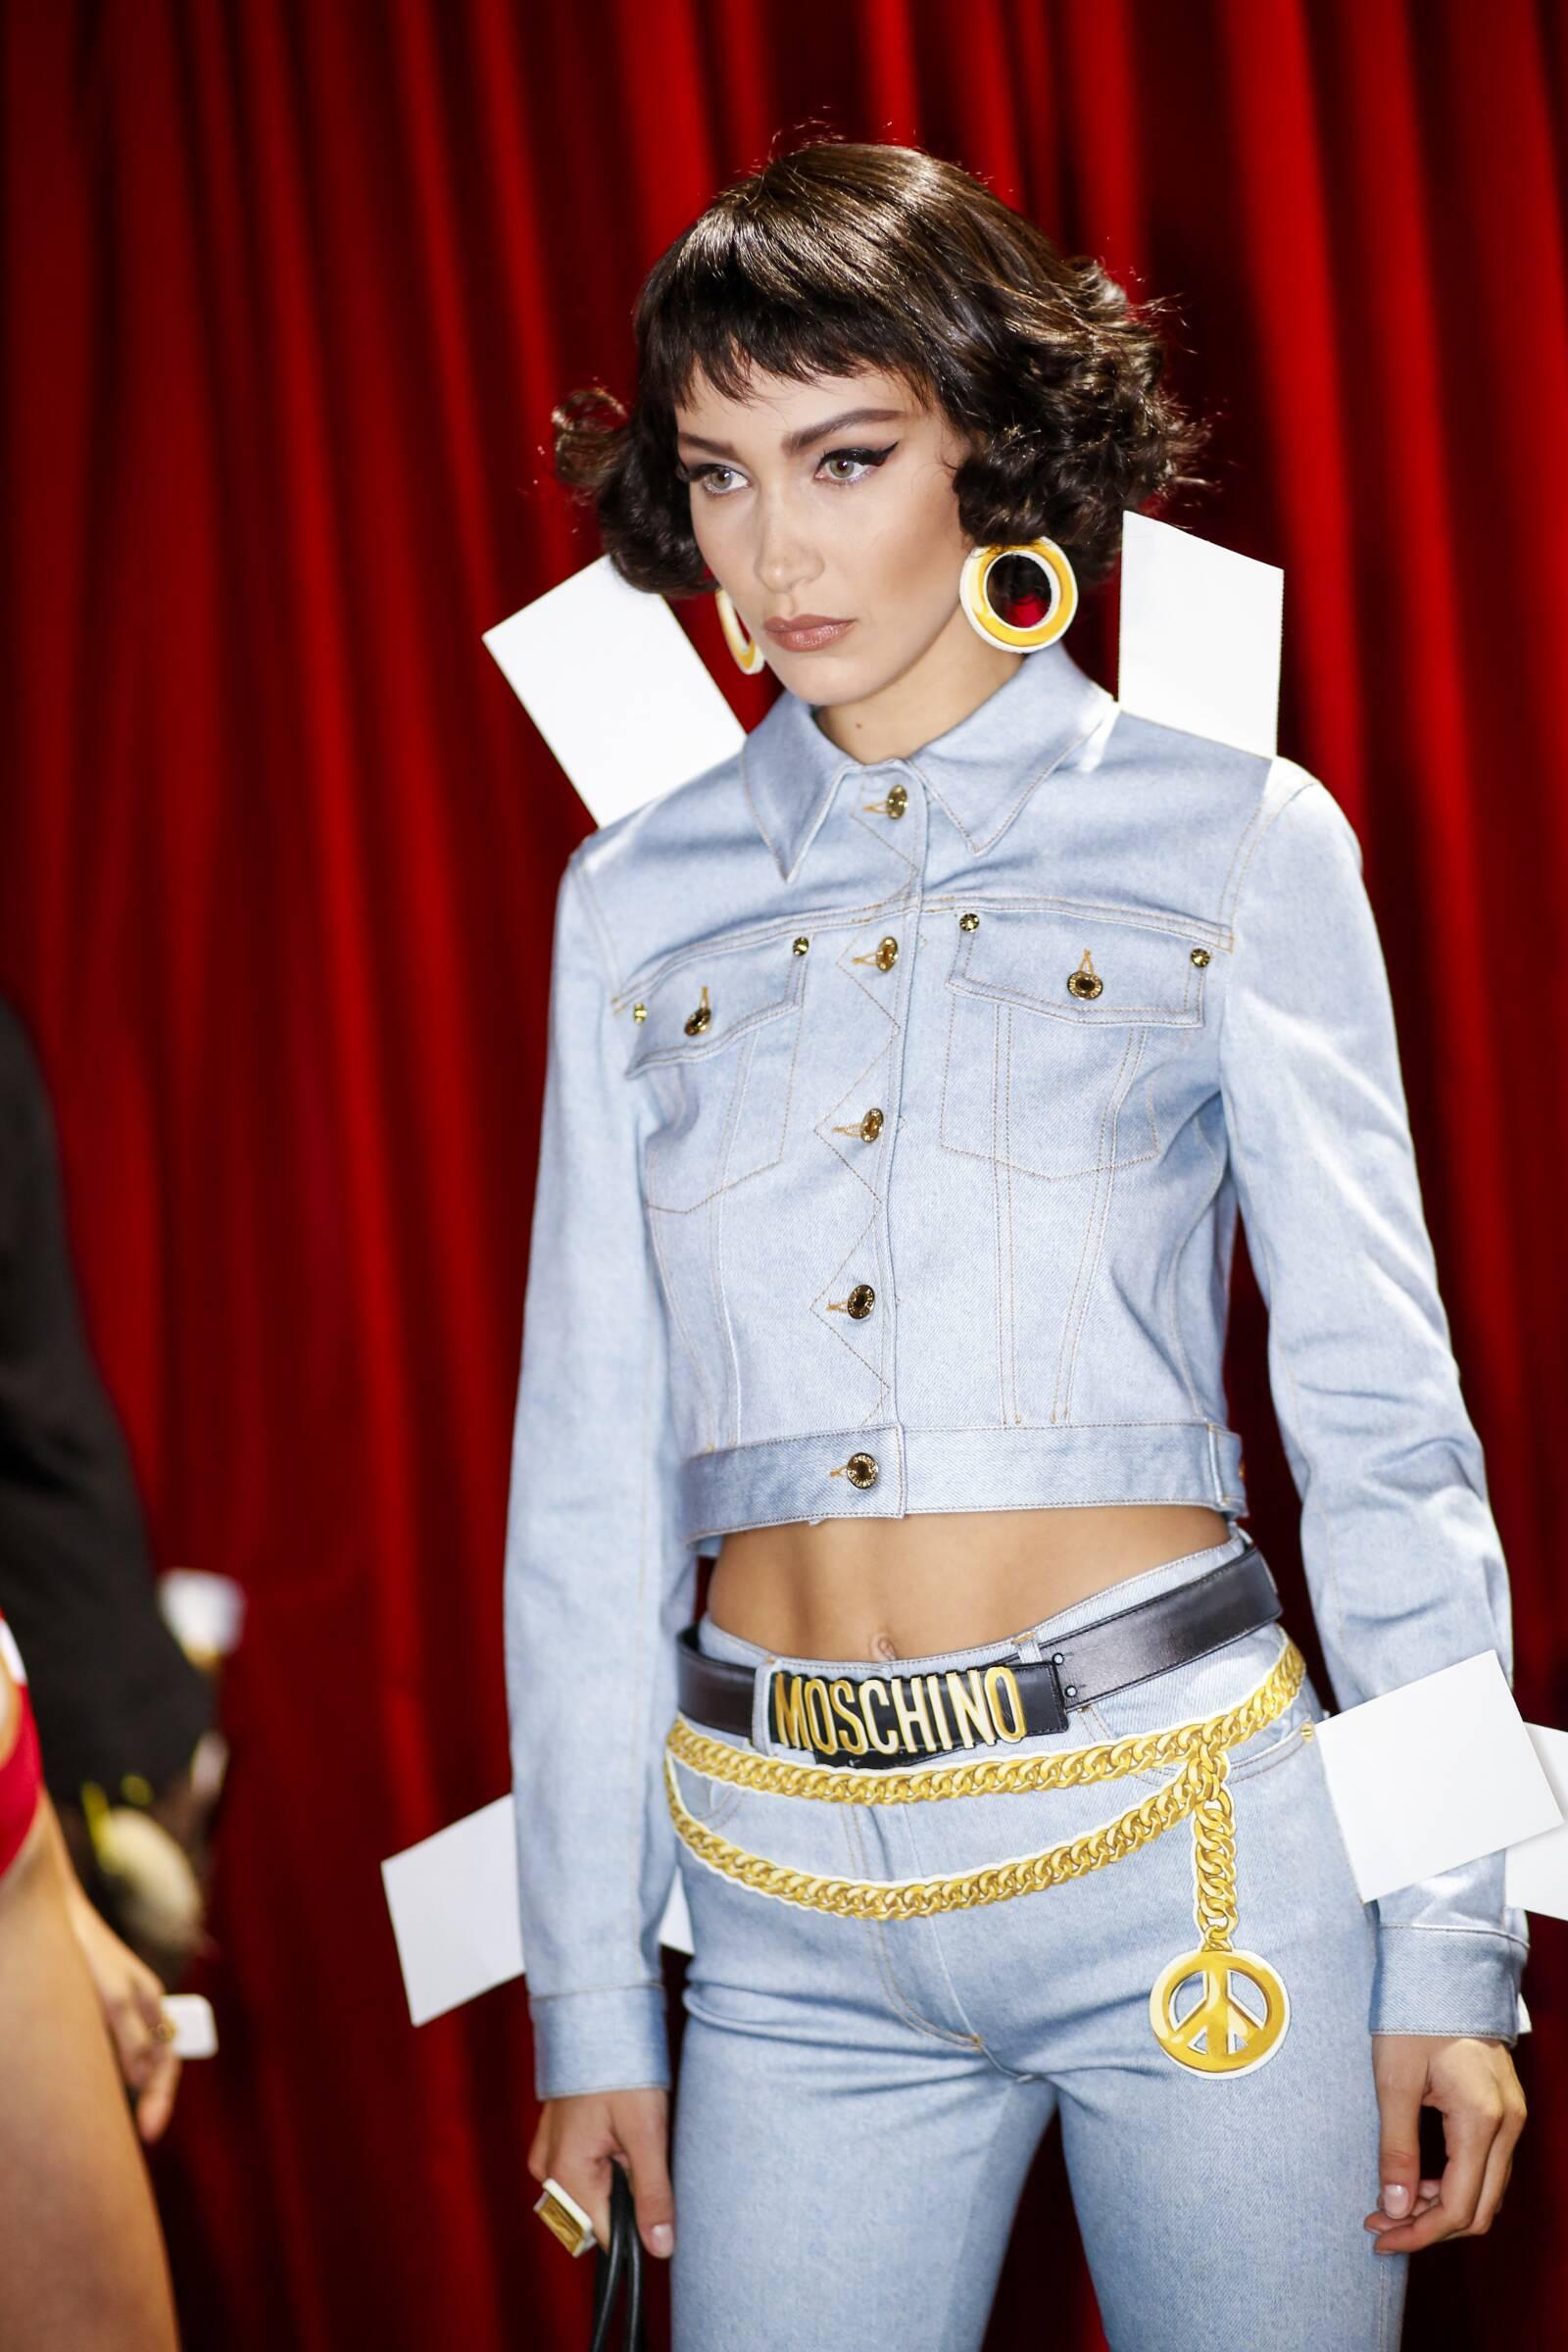 Backstage Woman Moschino SS 2017 Milan Fashion Week